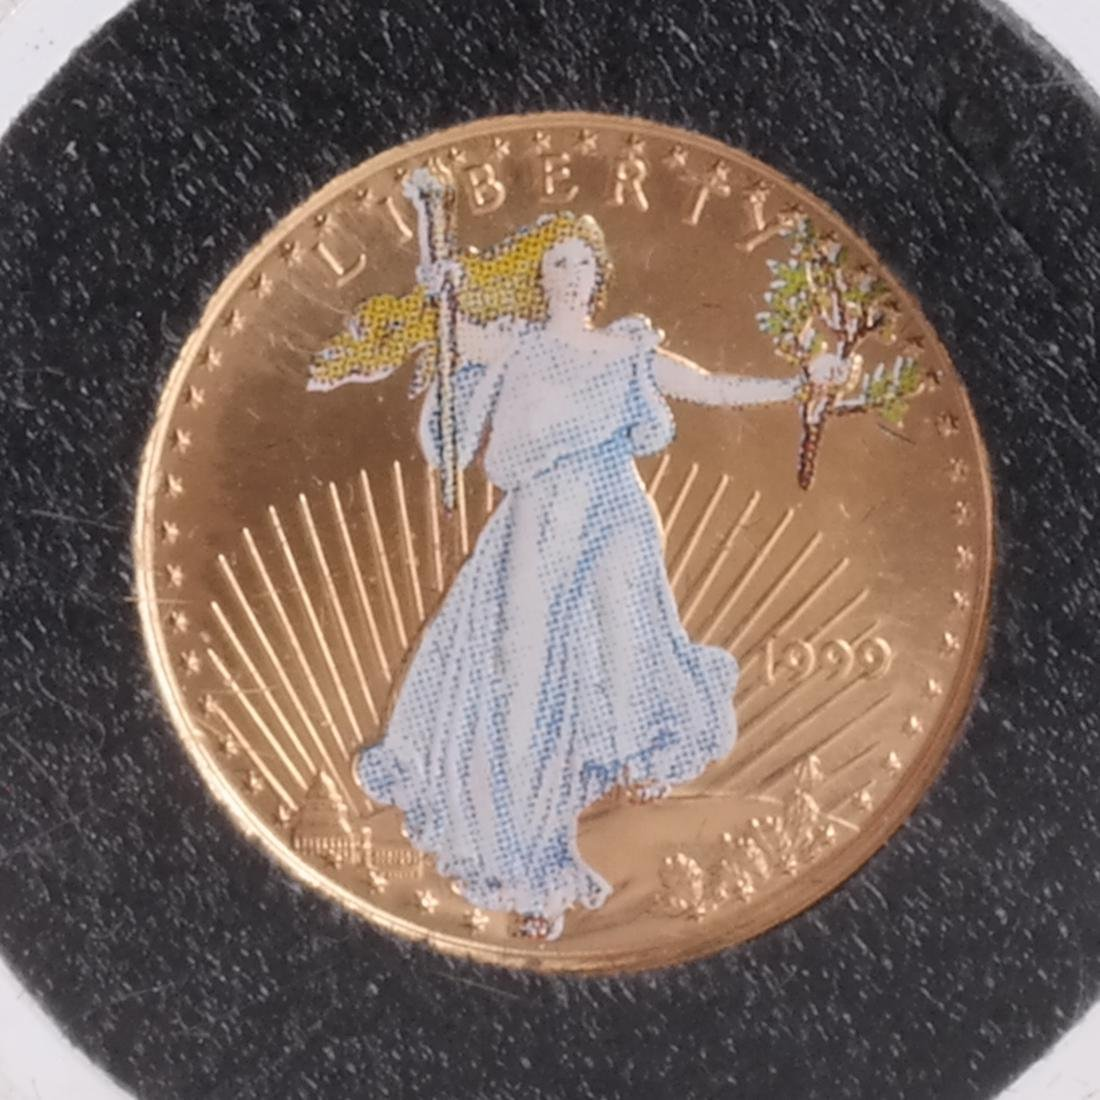 1999 Gold Eagle, Bicentennial, Kennedy - 6